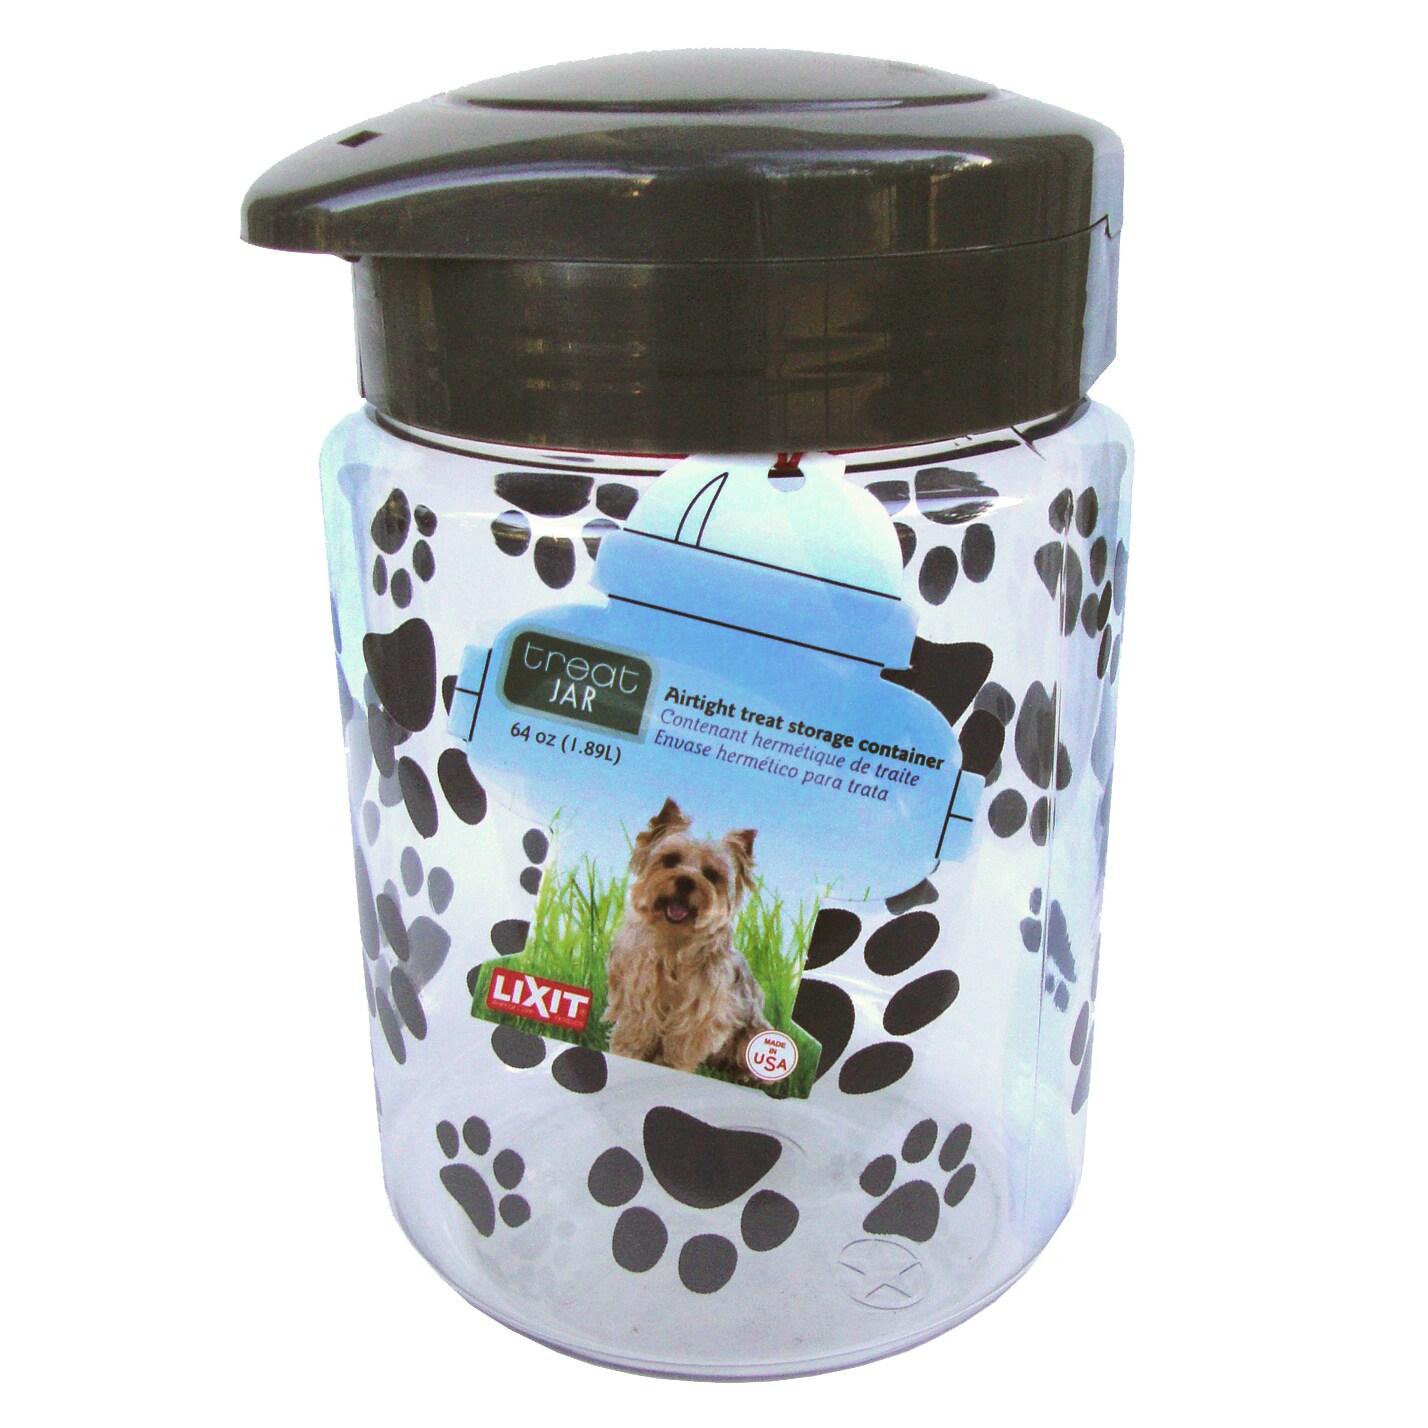 Lixit 128 Oz Dog Treat Jar (Dog Treat Jar Large), Black